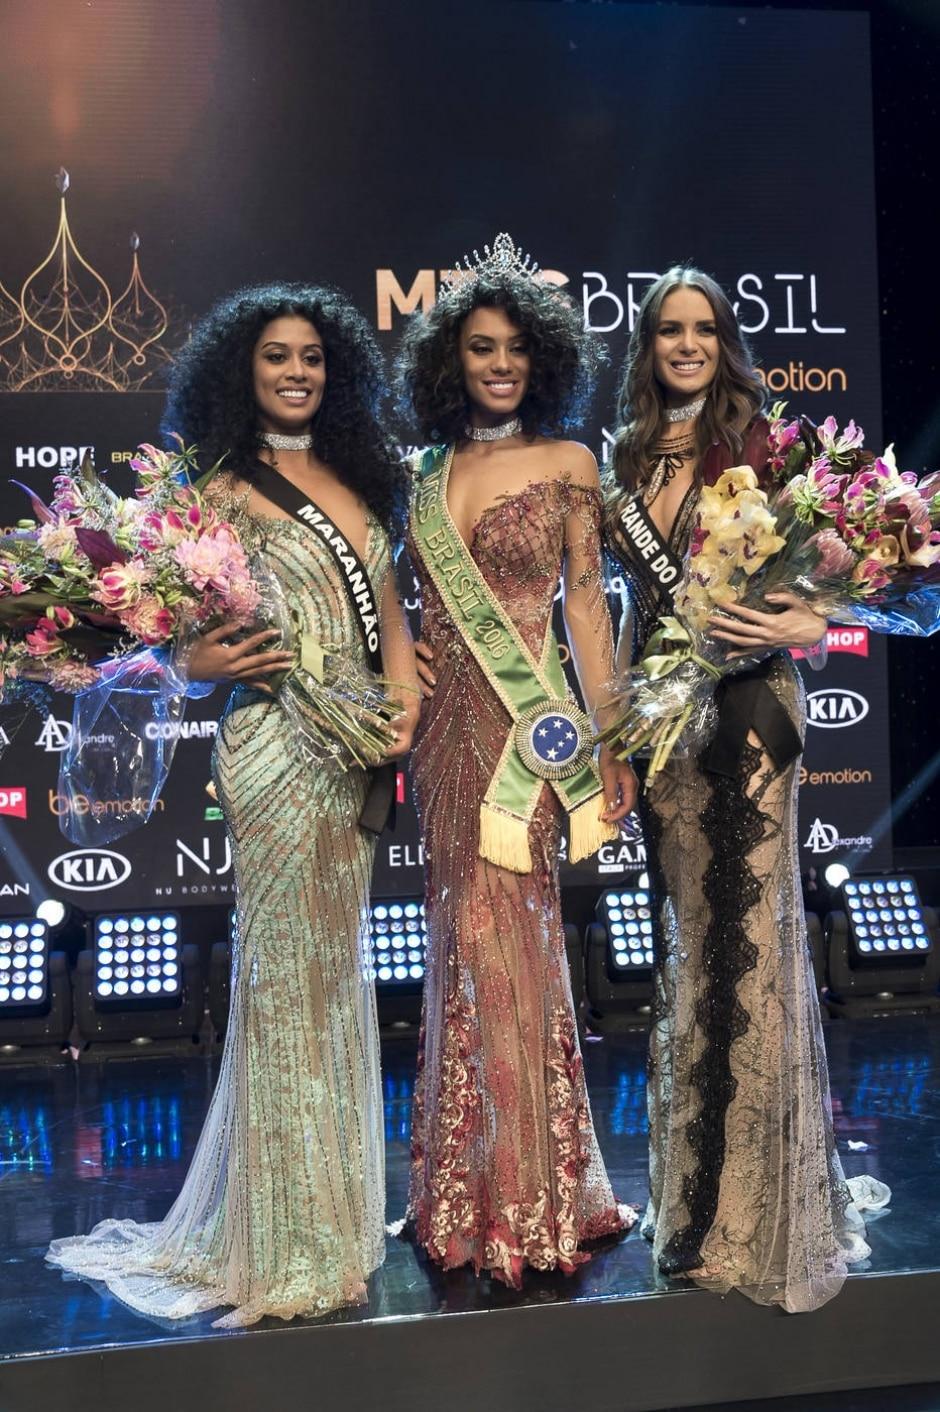 Lucas Ismael/Divulgação Miss Brasil BE Emotion